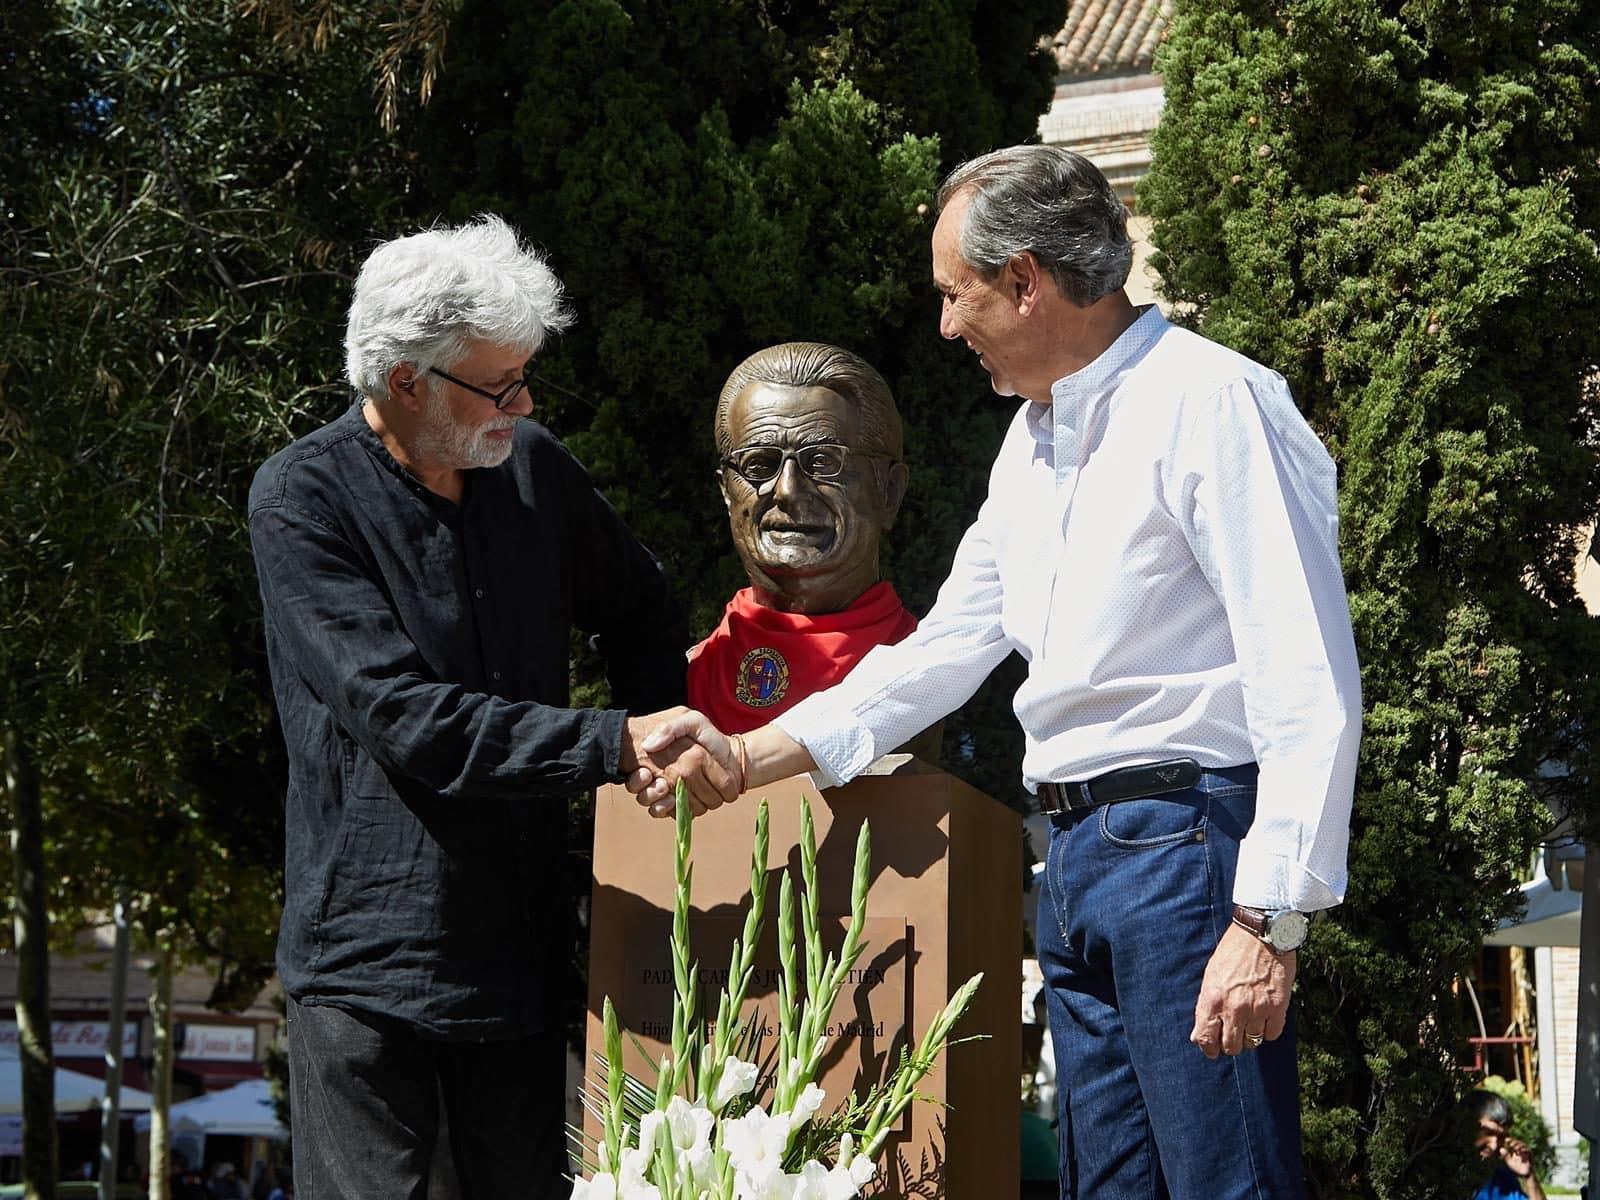 busto monumental en las Rozas